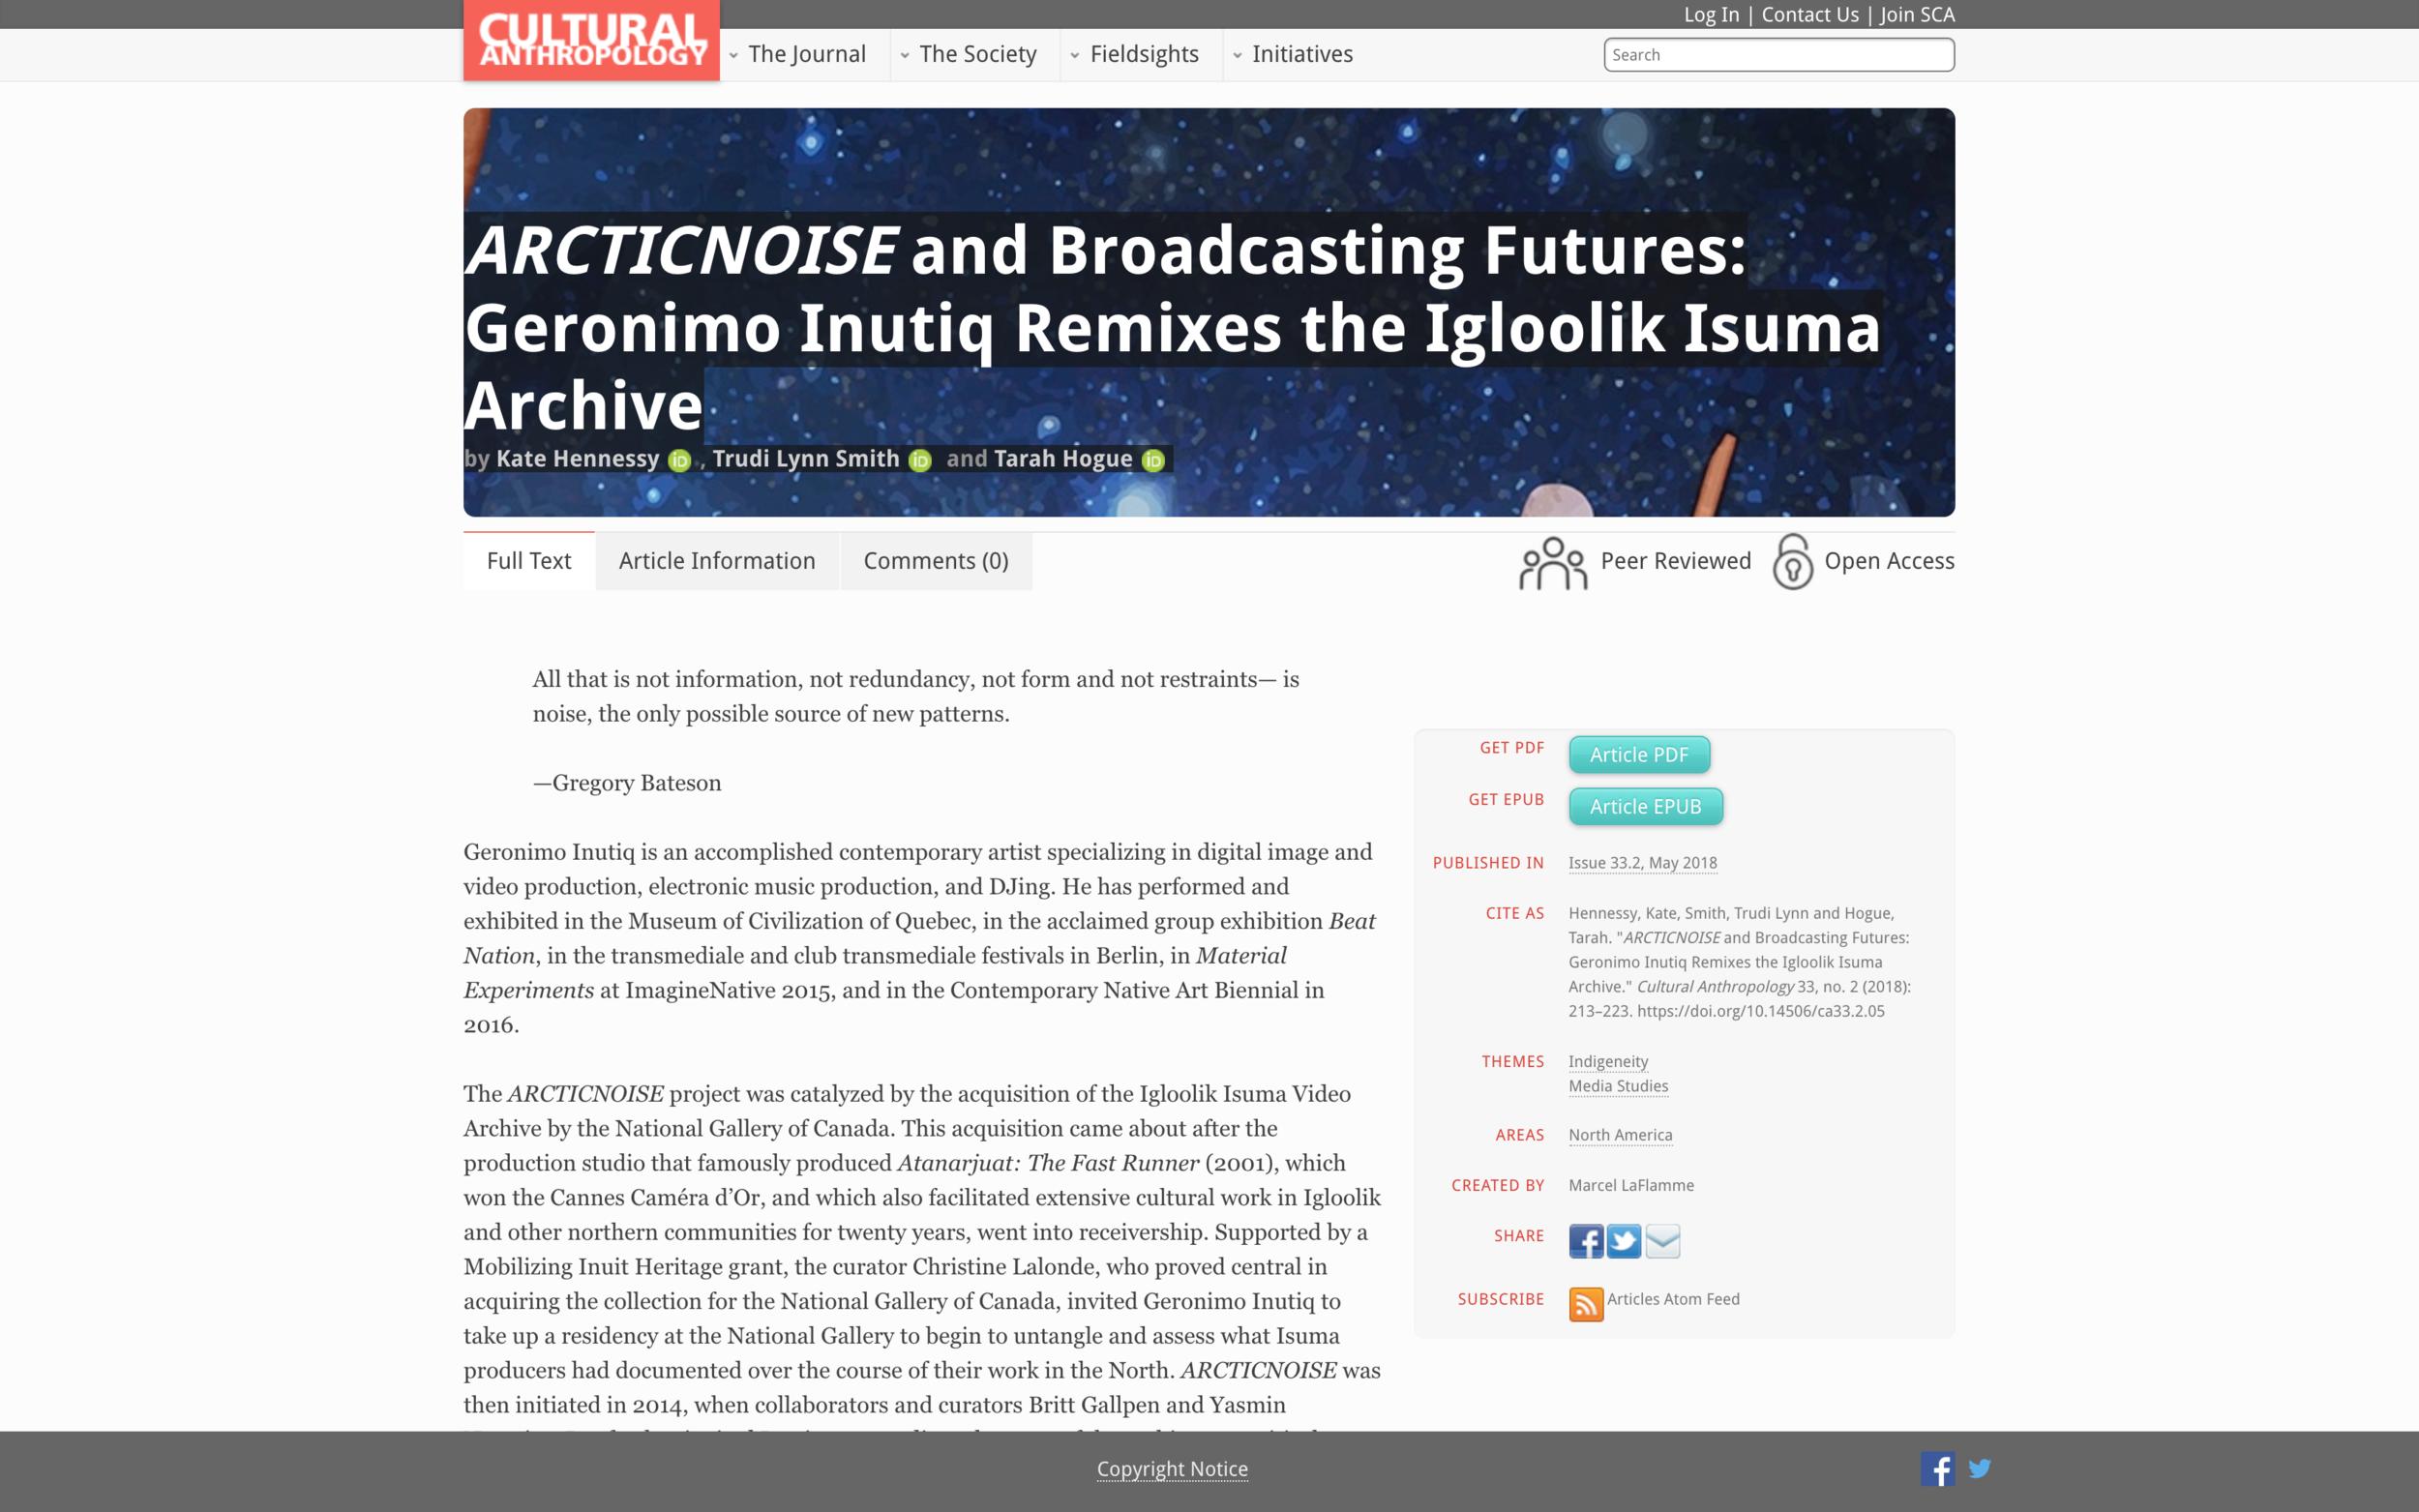 https://culanth.org/articles/952-em-arcticnoise-em-and-broadcasting-futures